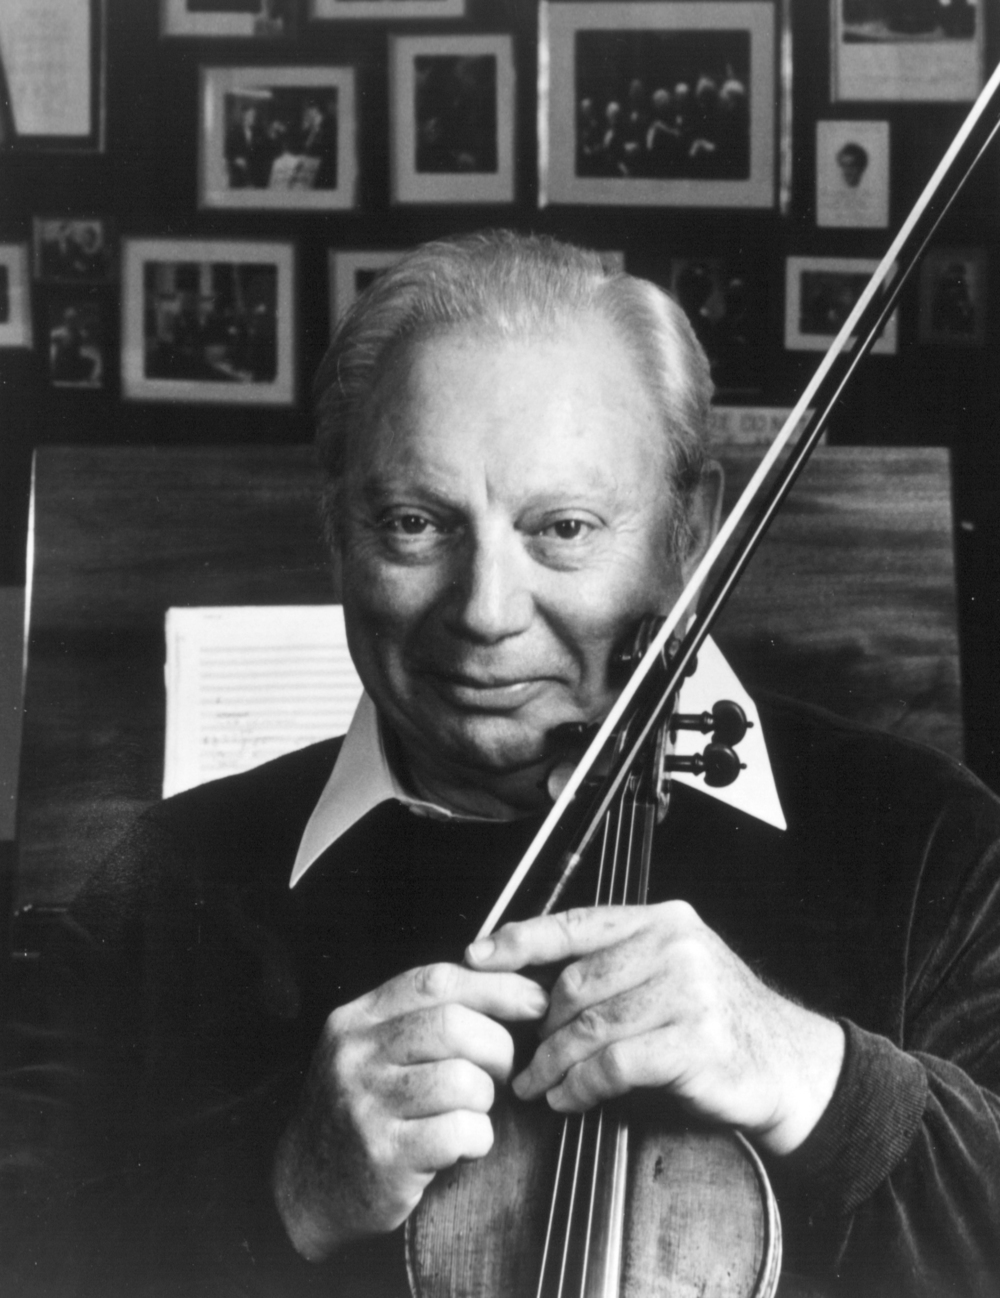 Legendary violinist, Isaac Stern